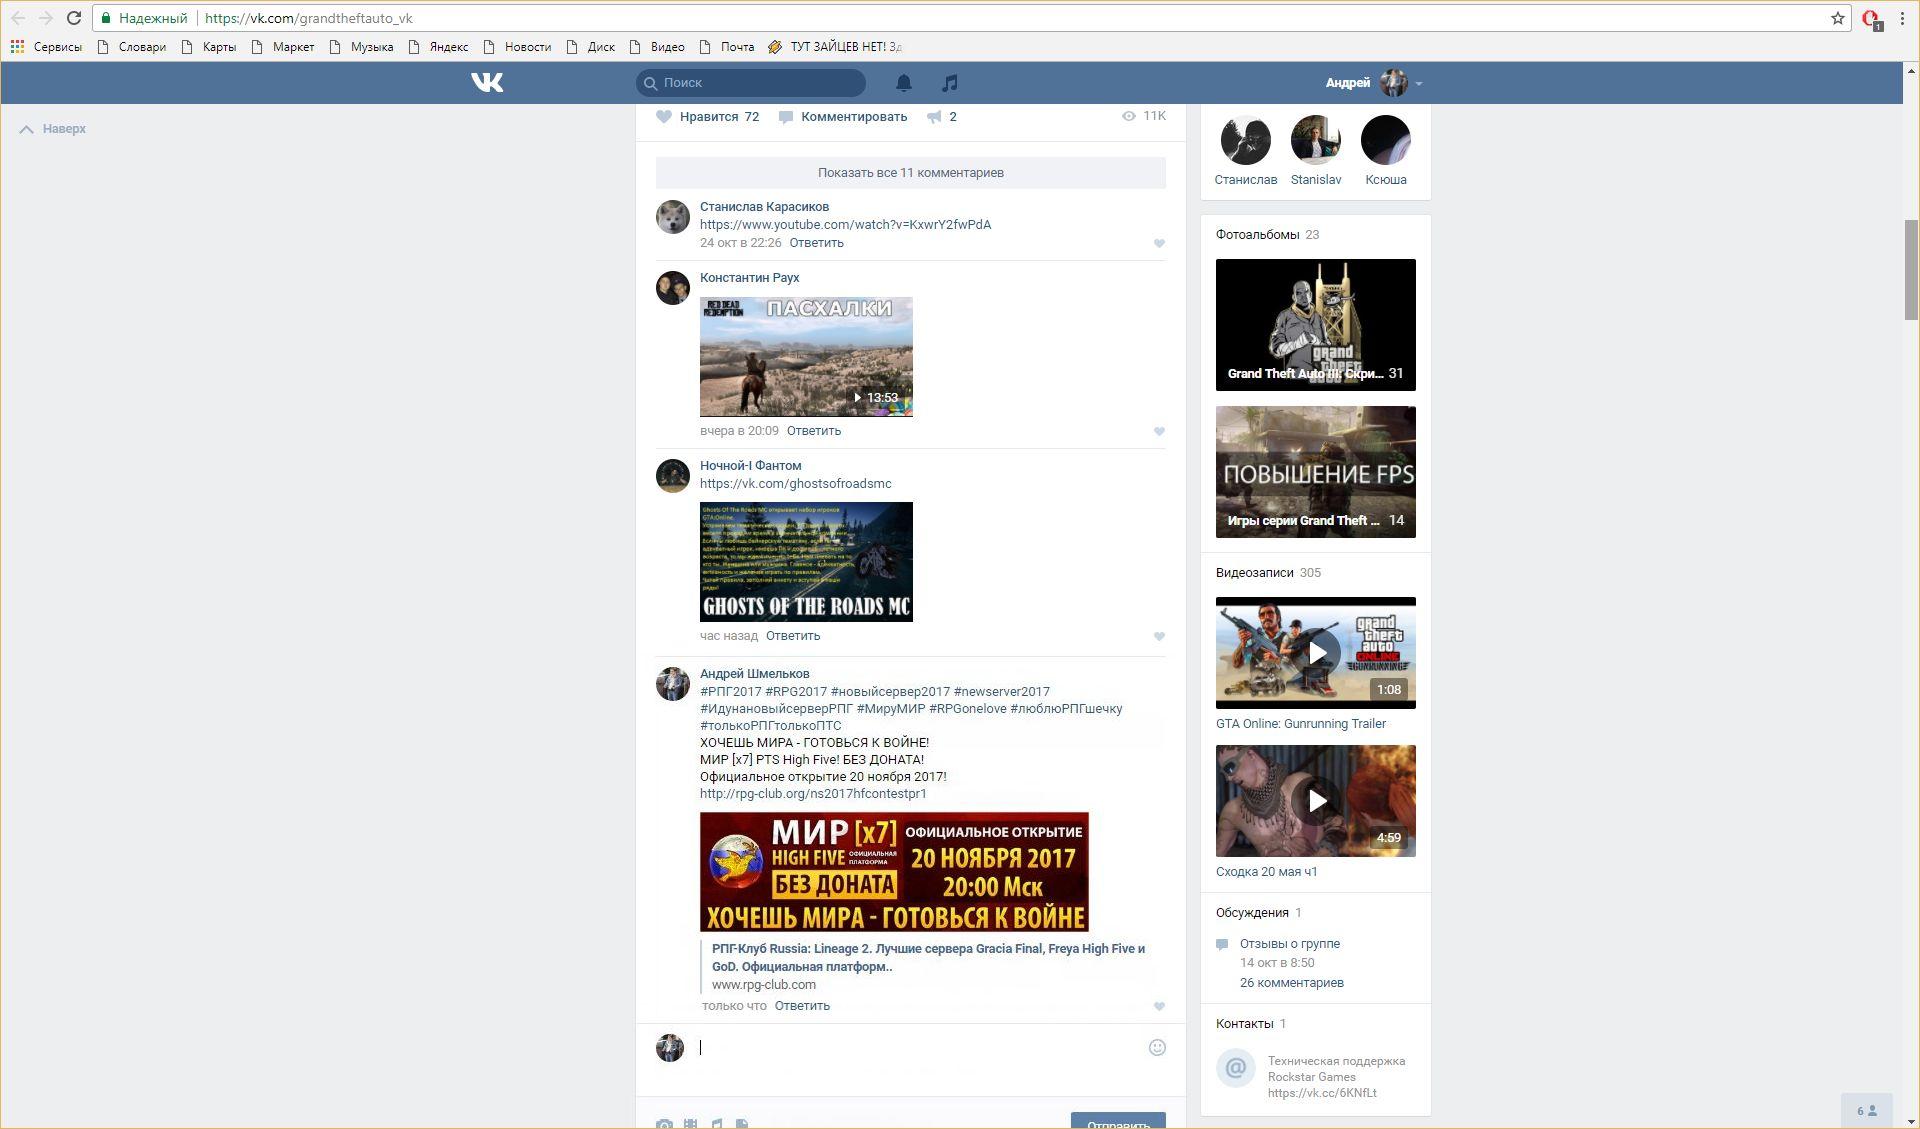 Lineage 2 Screenshot: Анонсы lineage 2 официальная